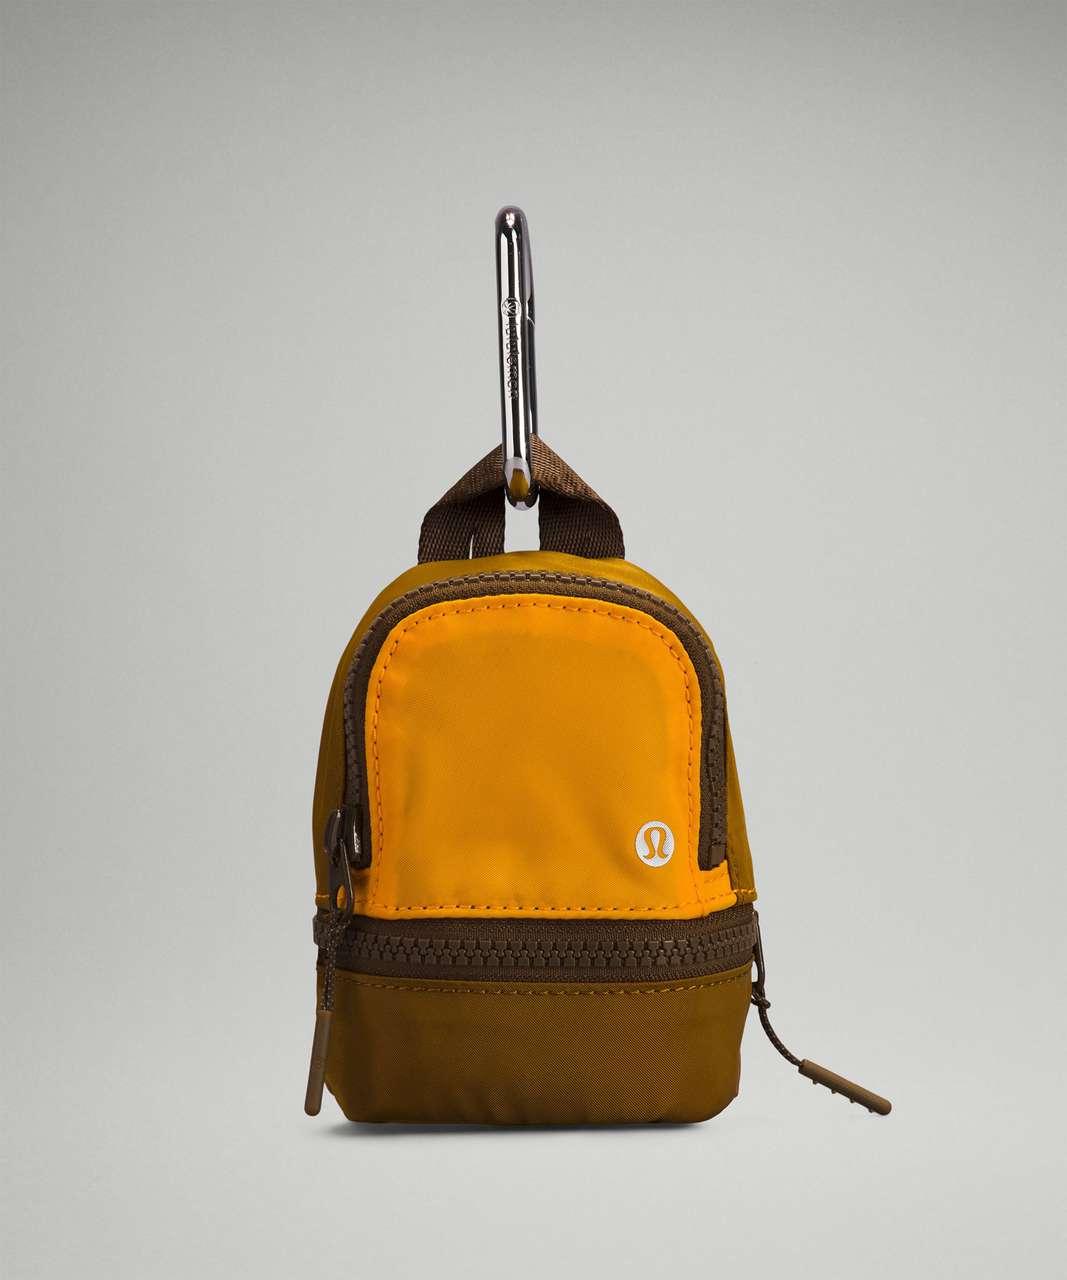 Lululemon City Adventurer Backpack *Nano - Clementine / Gold Spice